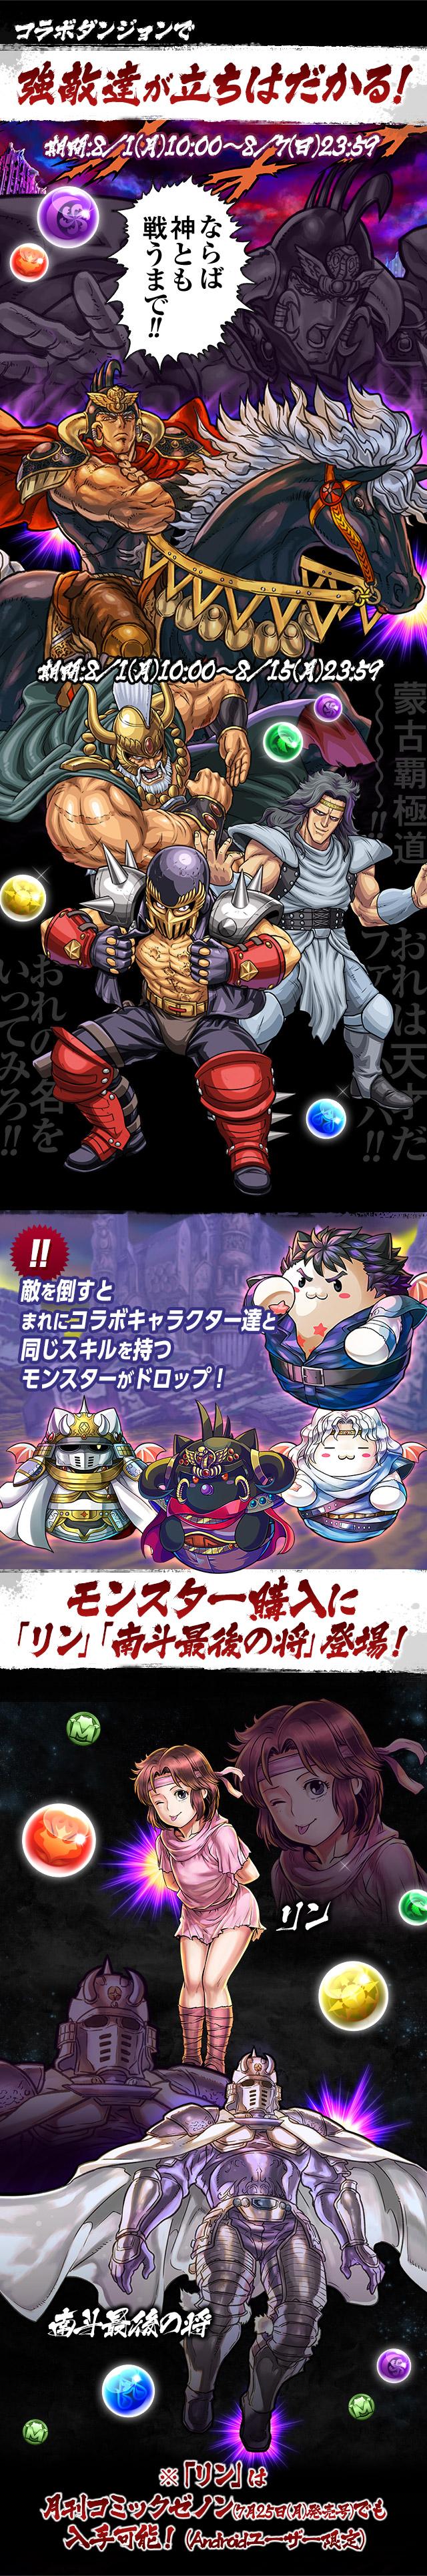 hokuto_02_6.jpg